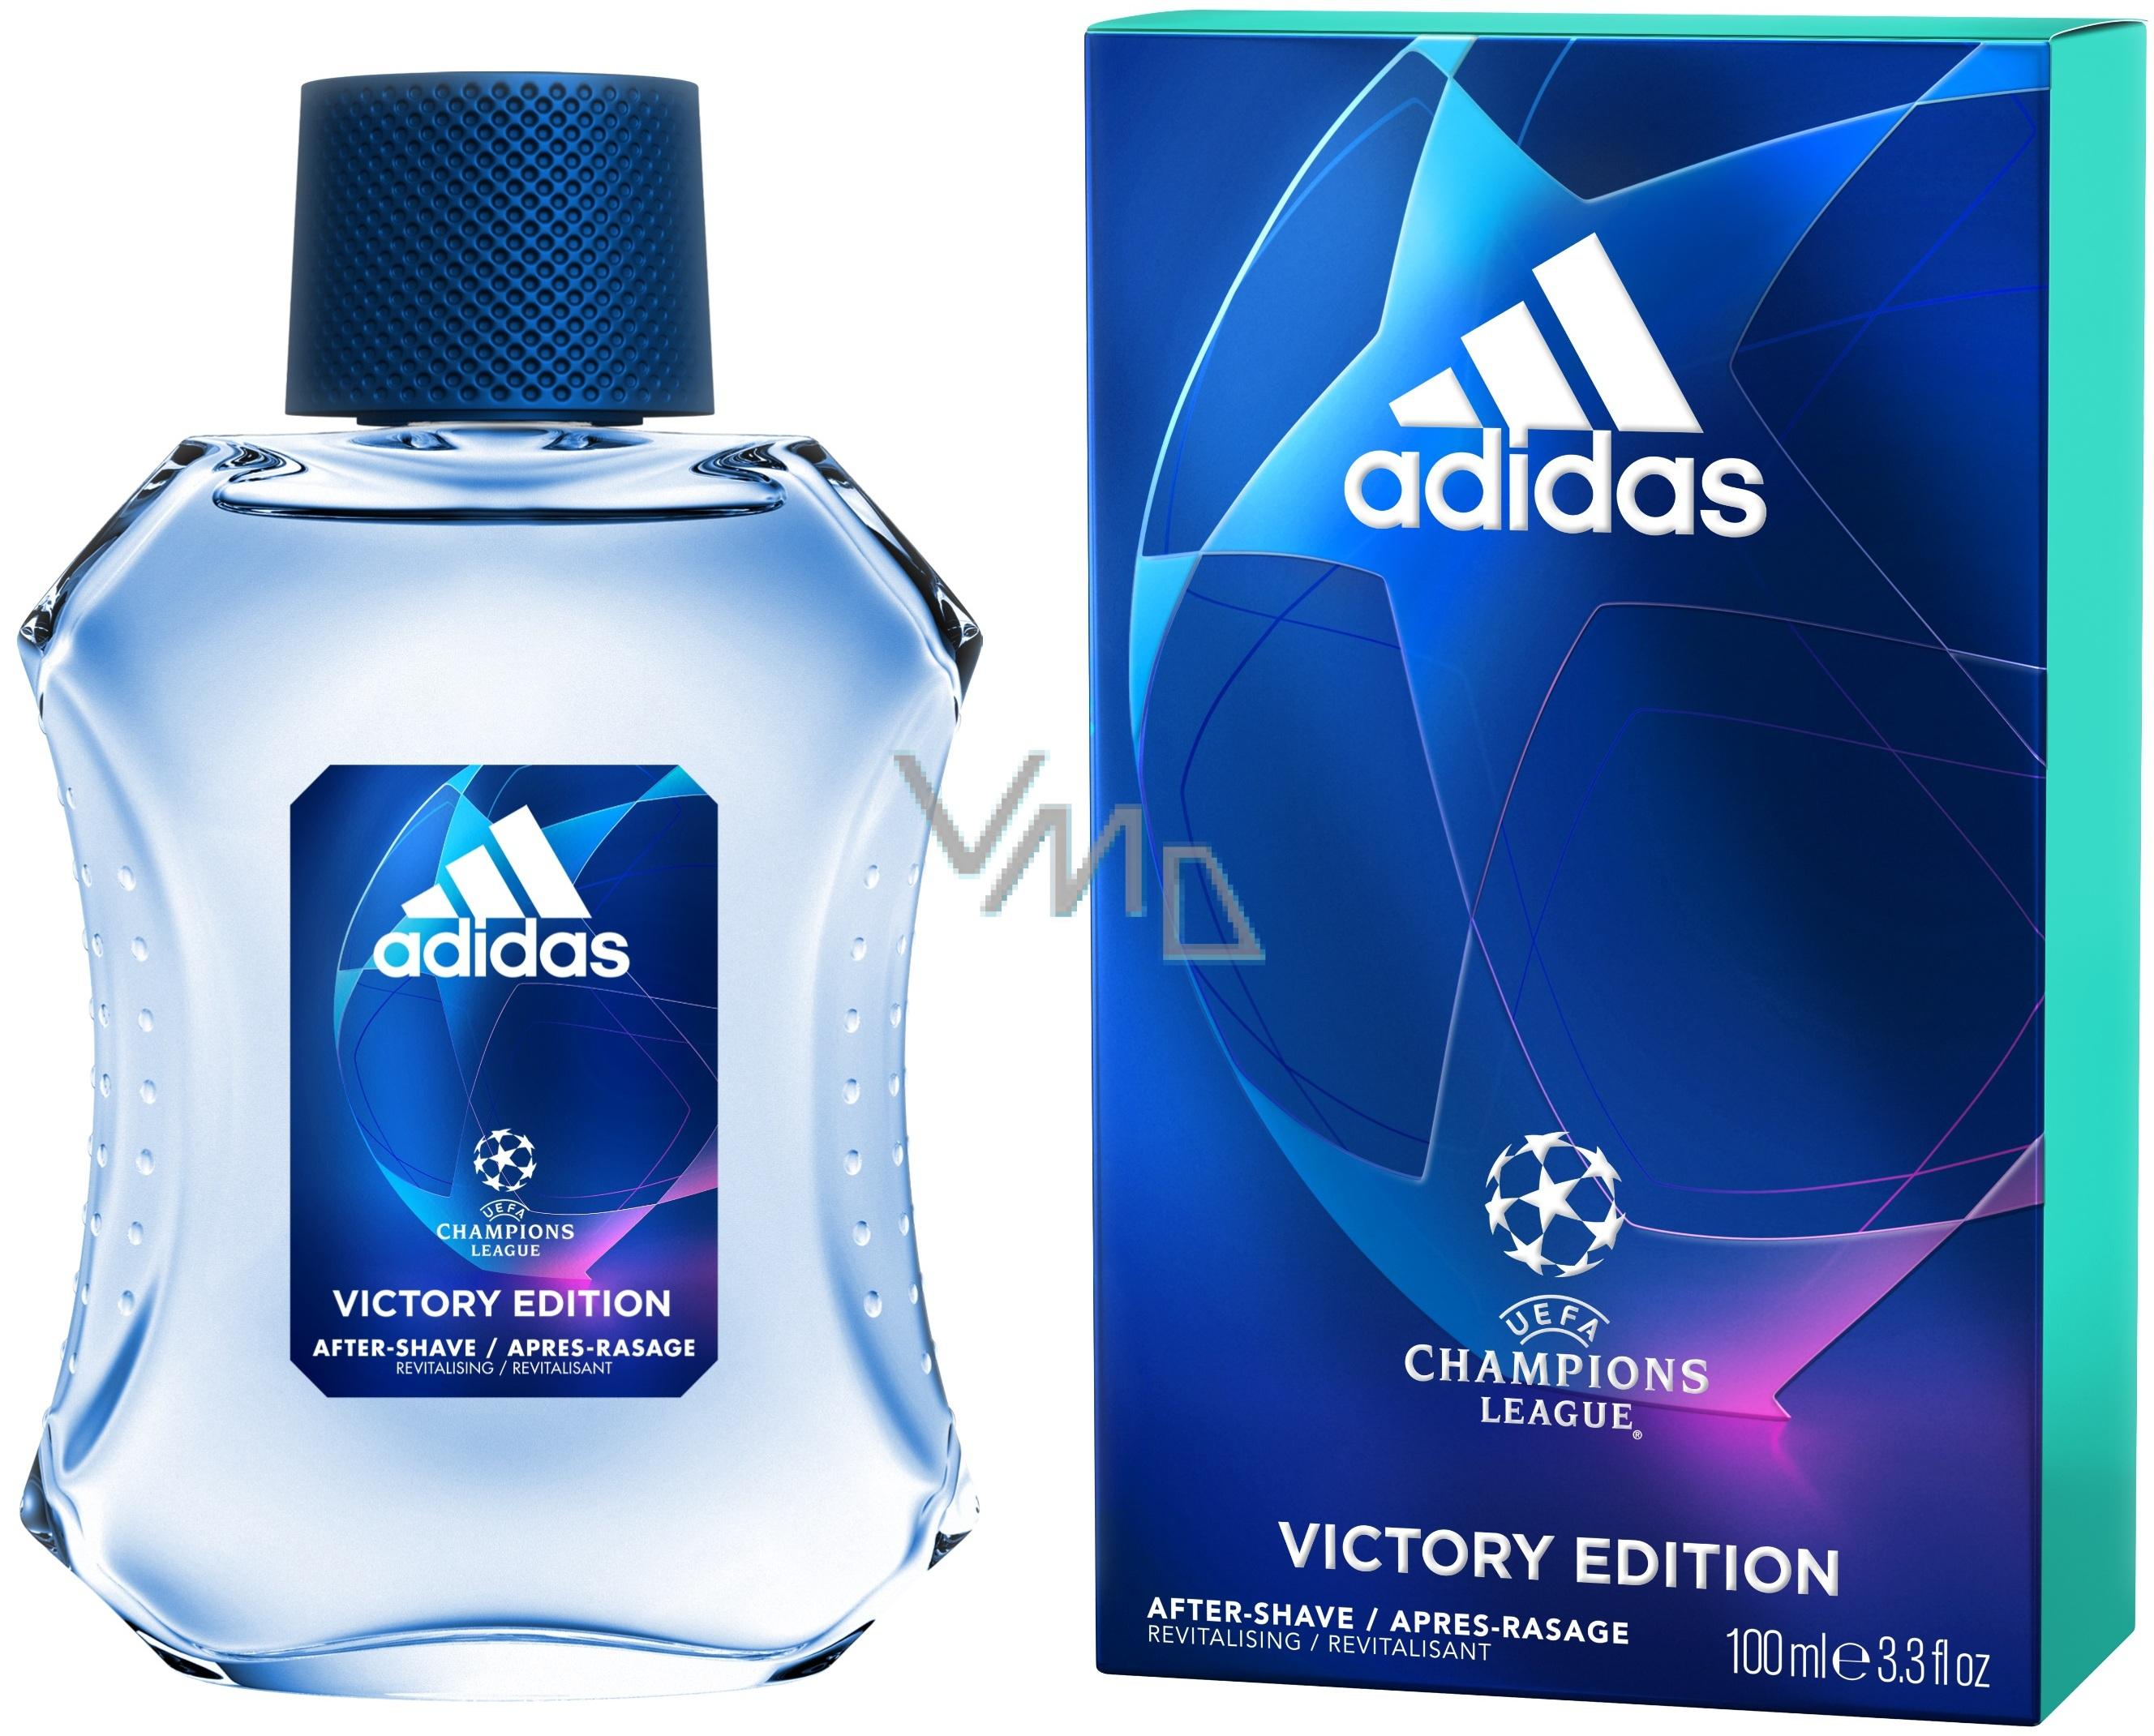 dólar estadounidense Emular Rítmico  Adidas UEFA Champions League Victory Edition aftershave 100 ml - VMD  parfumerie - drogerie